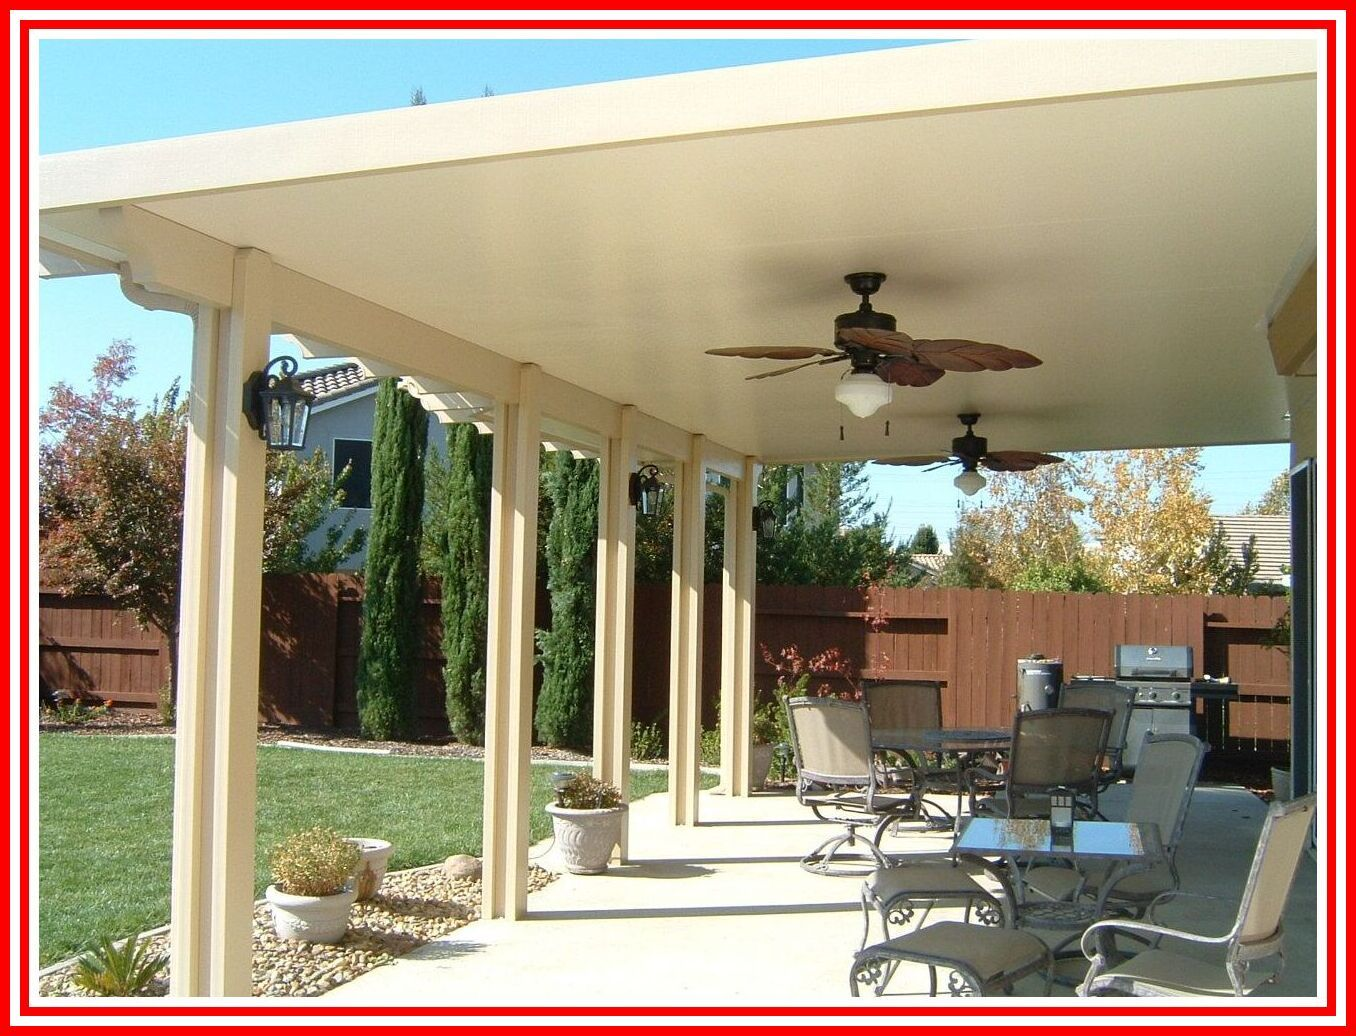 61 Reference Of Aluminum Patio Roof Cost In 2020 Backyard Gazebo Backyard Patio Furniture Patio